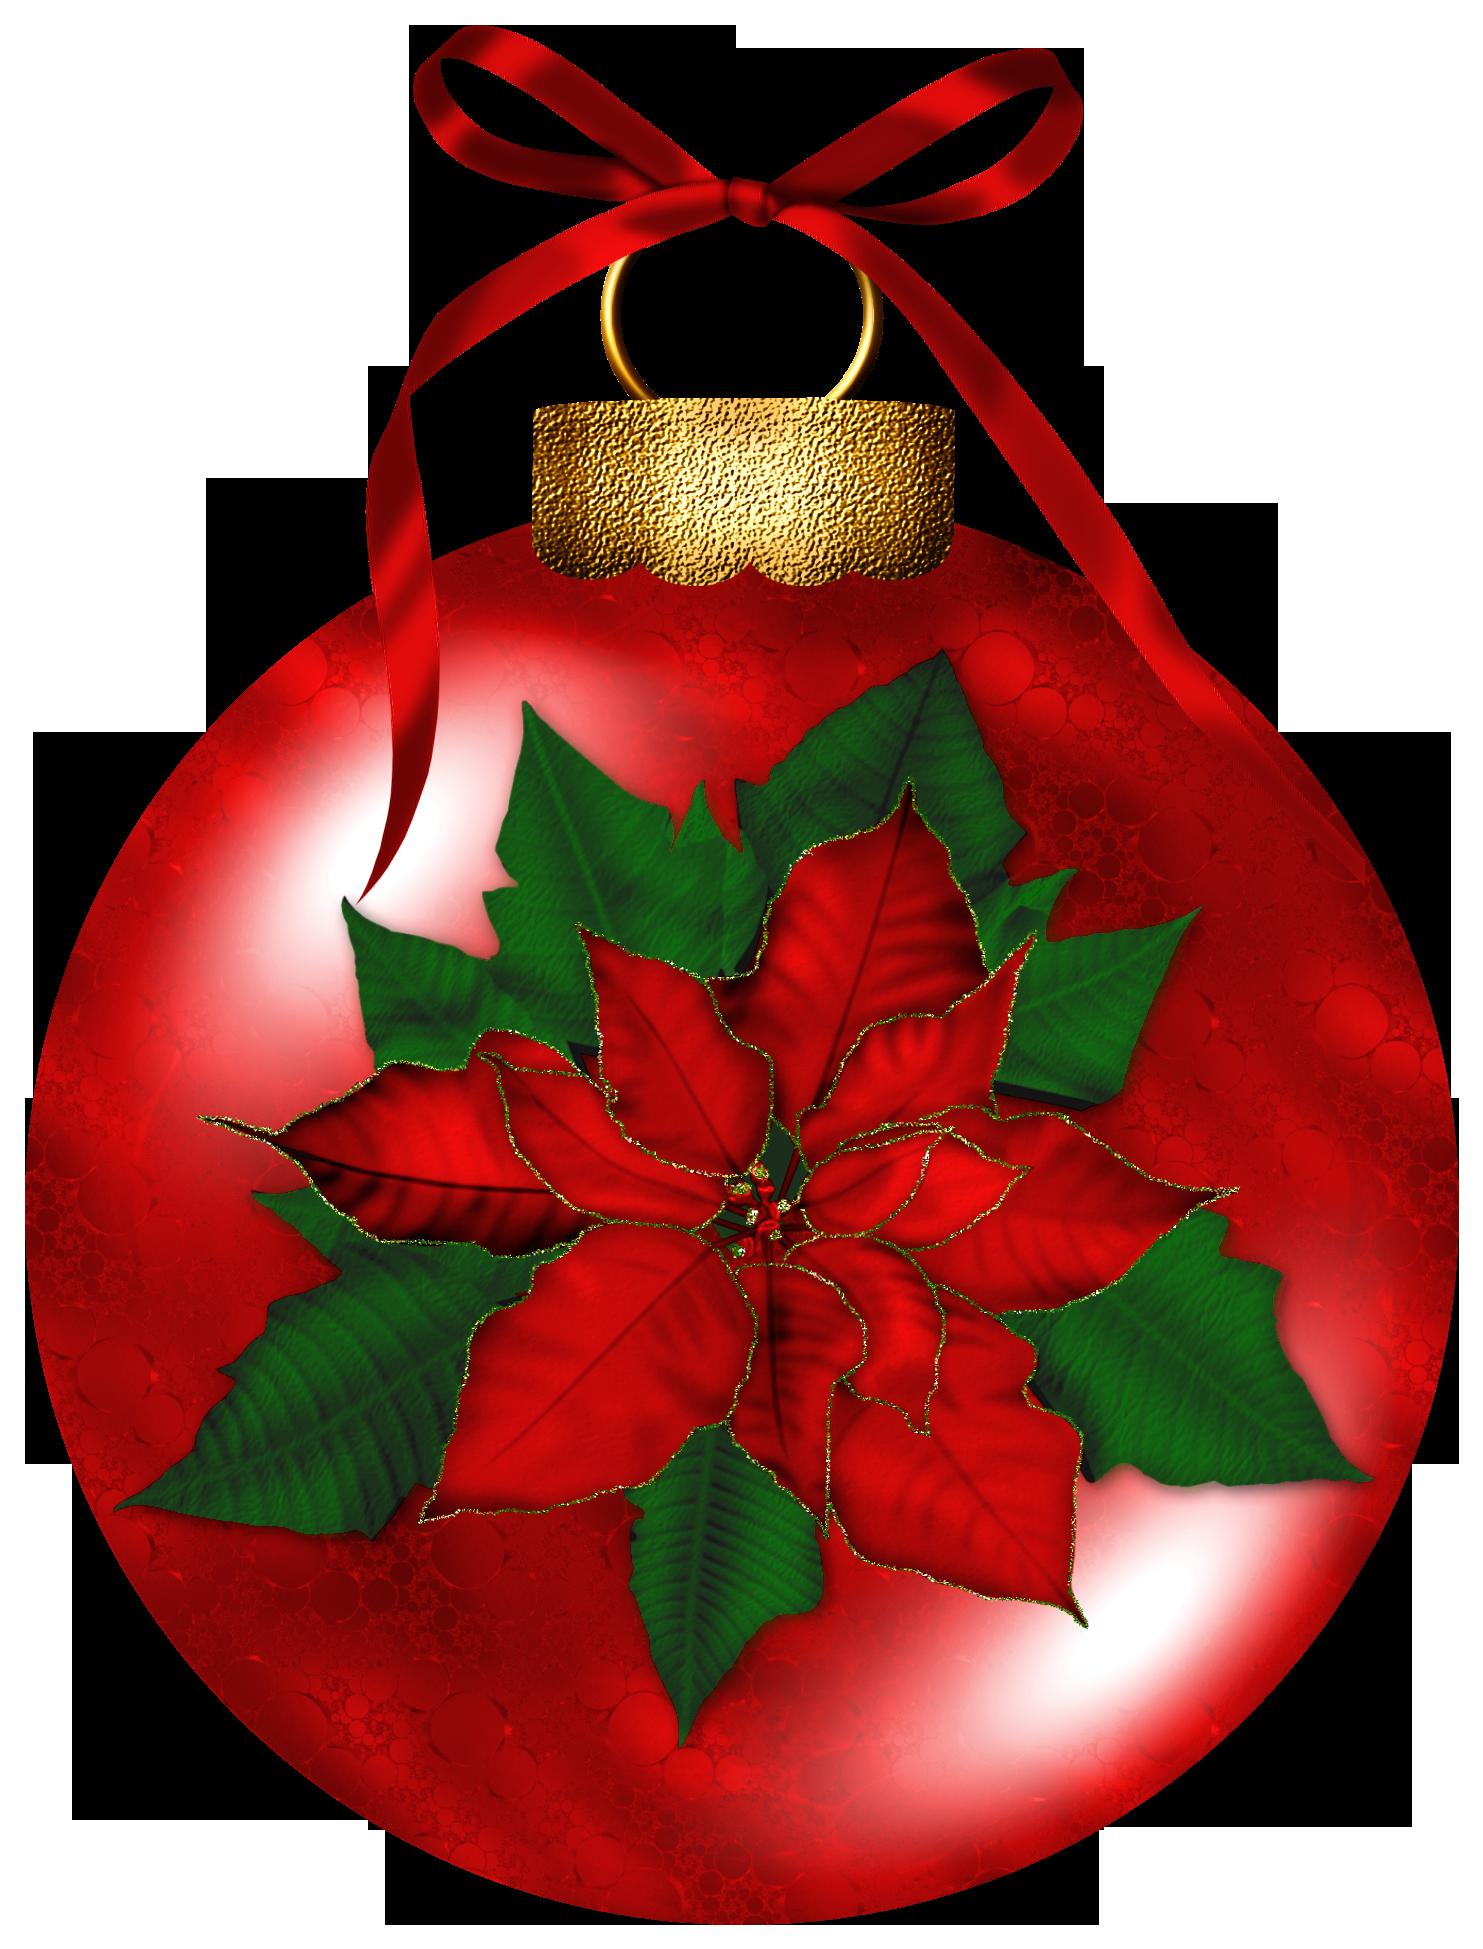 Poinsettias clipart ornament. Poinsettia holiday garland free